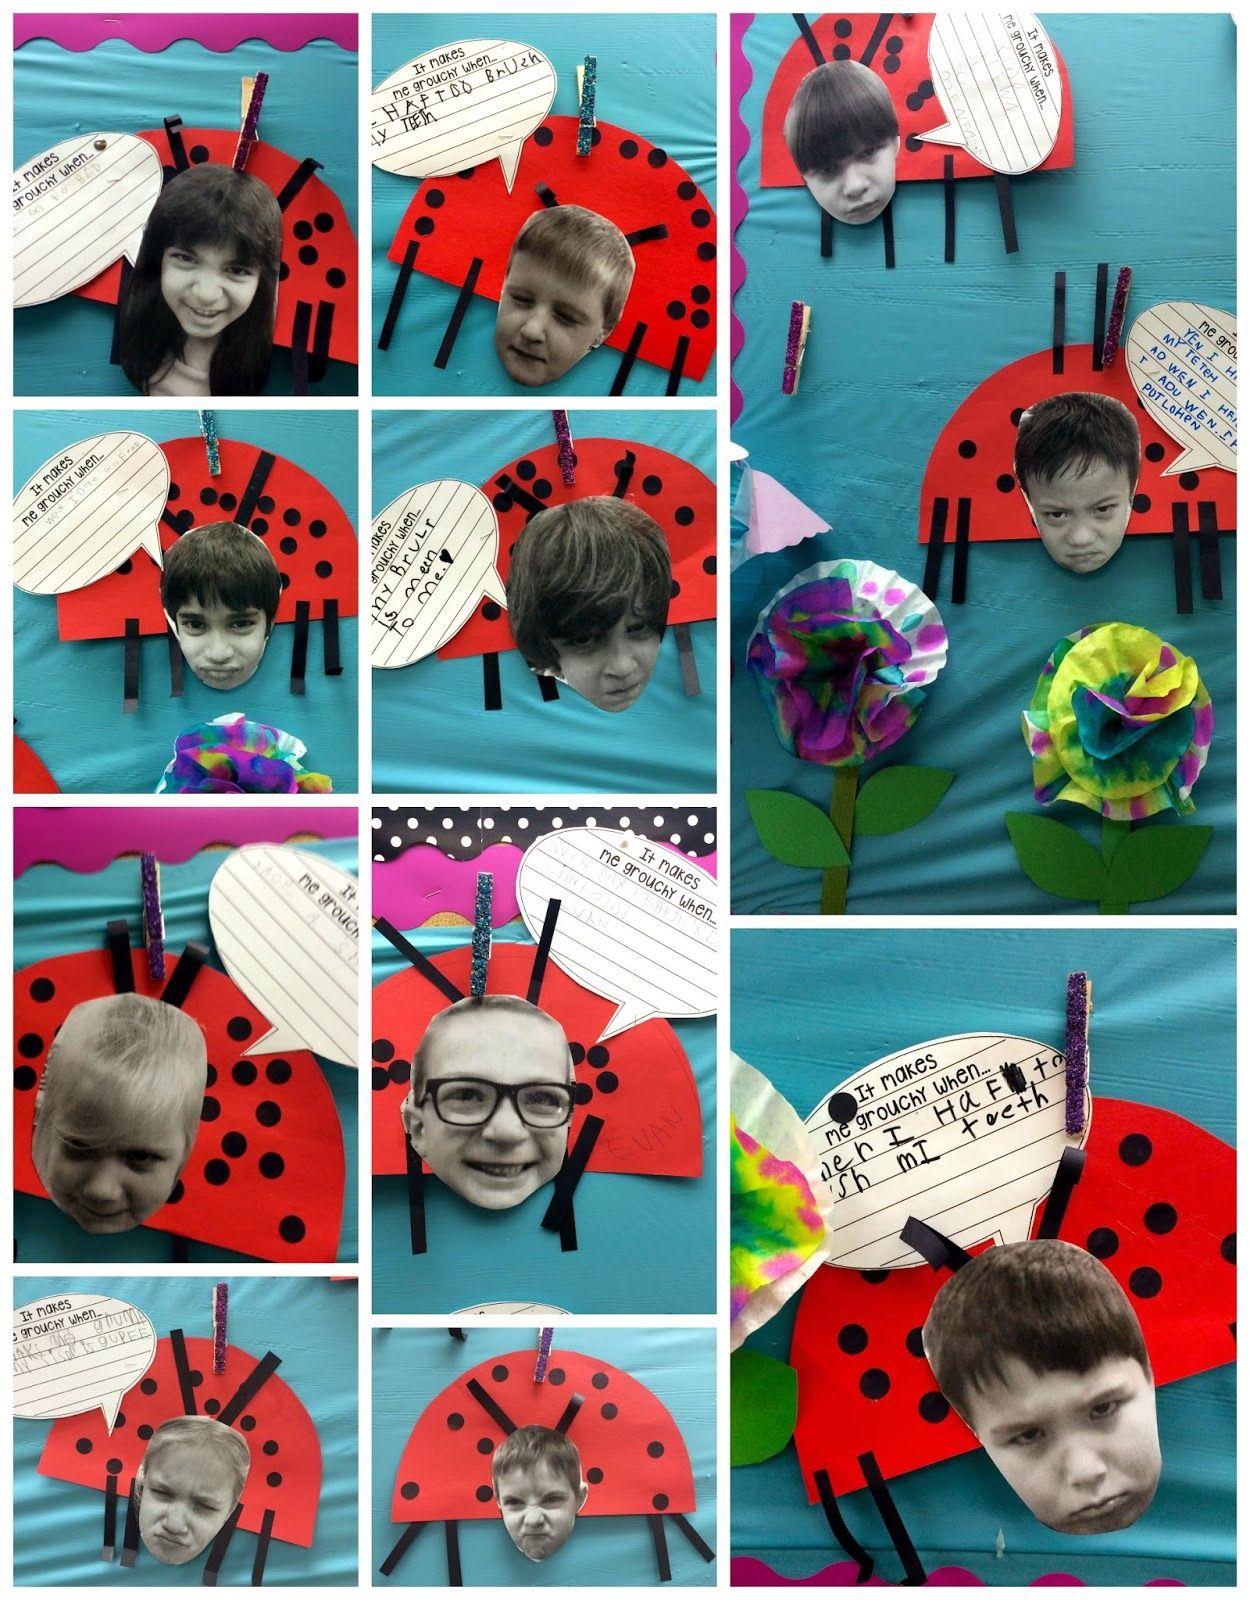 The Very Grouchy Ladybug